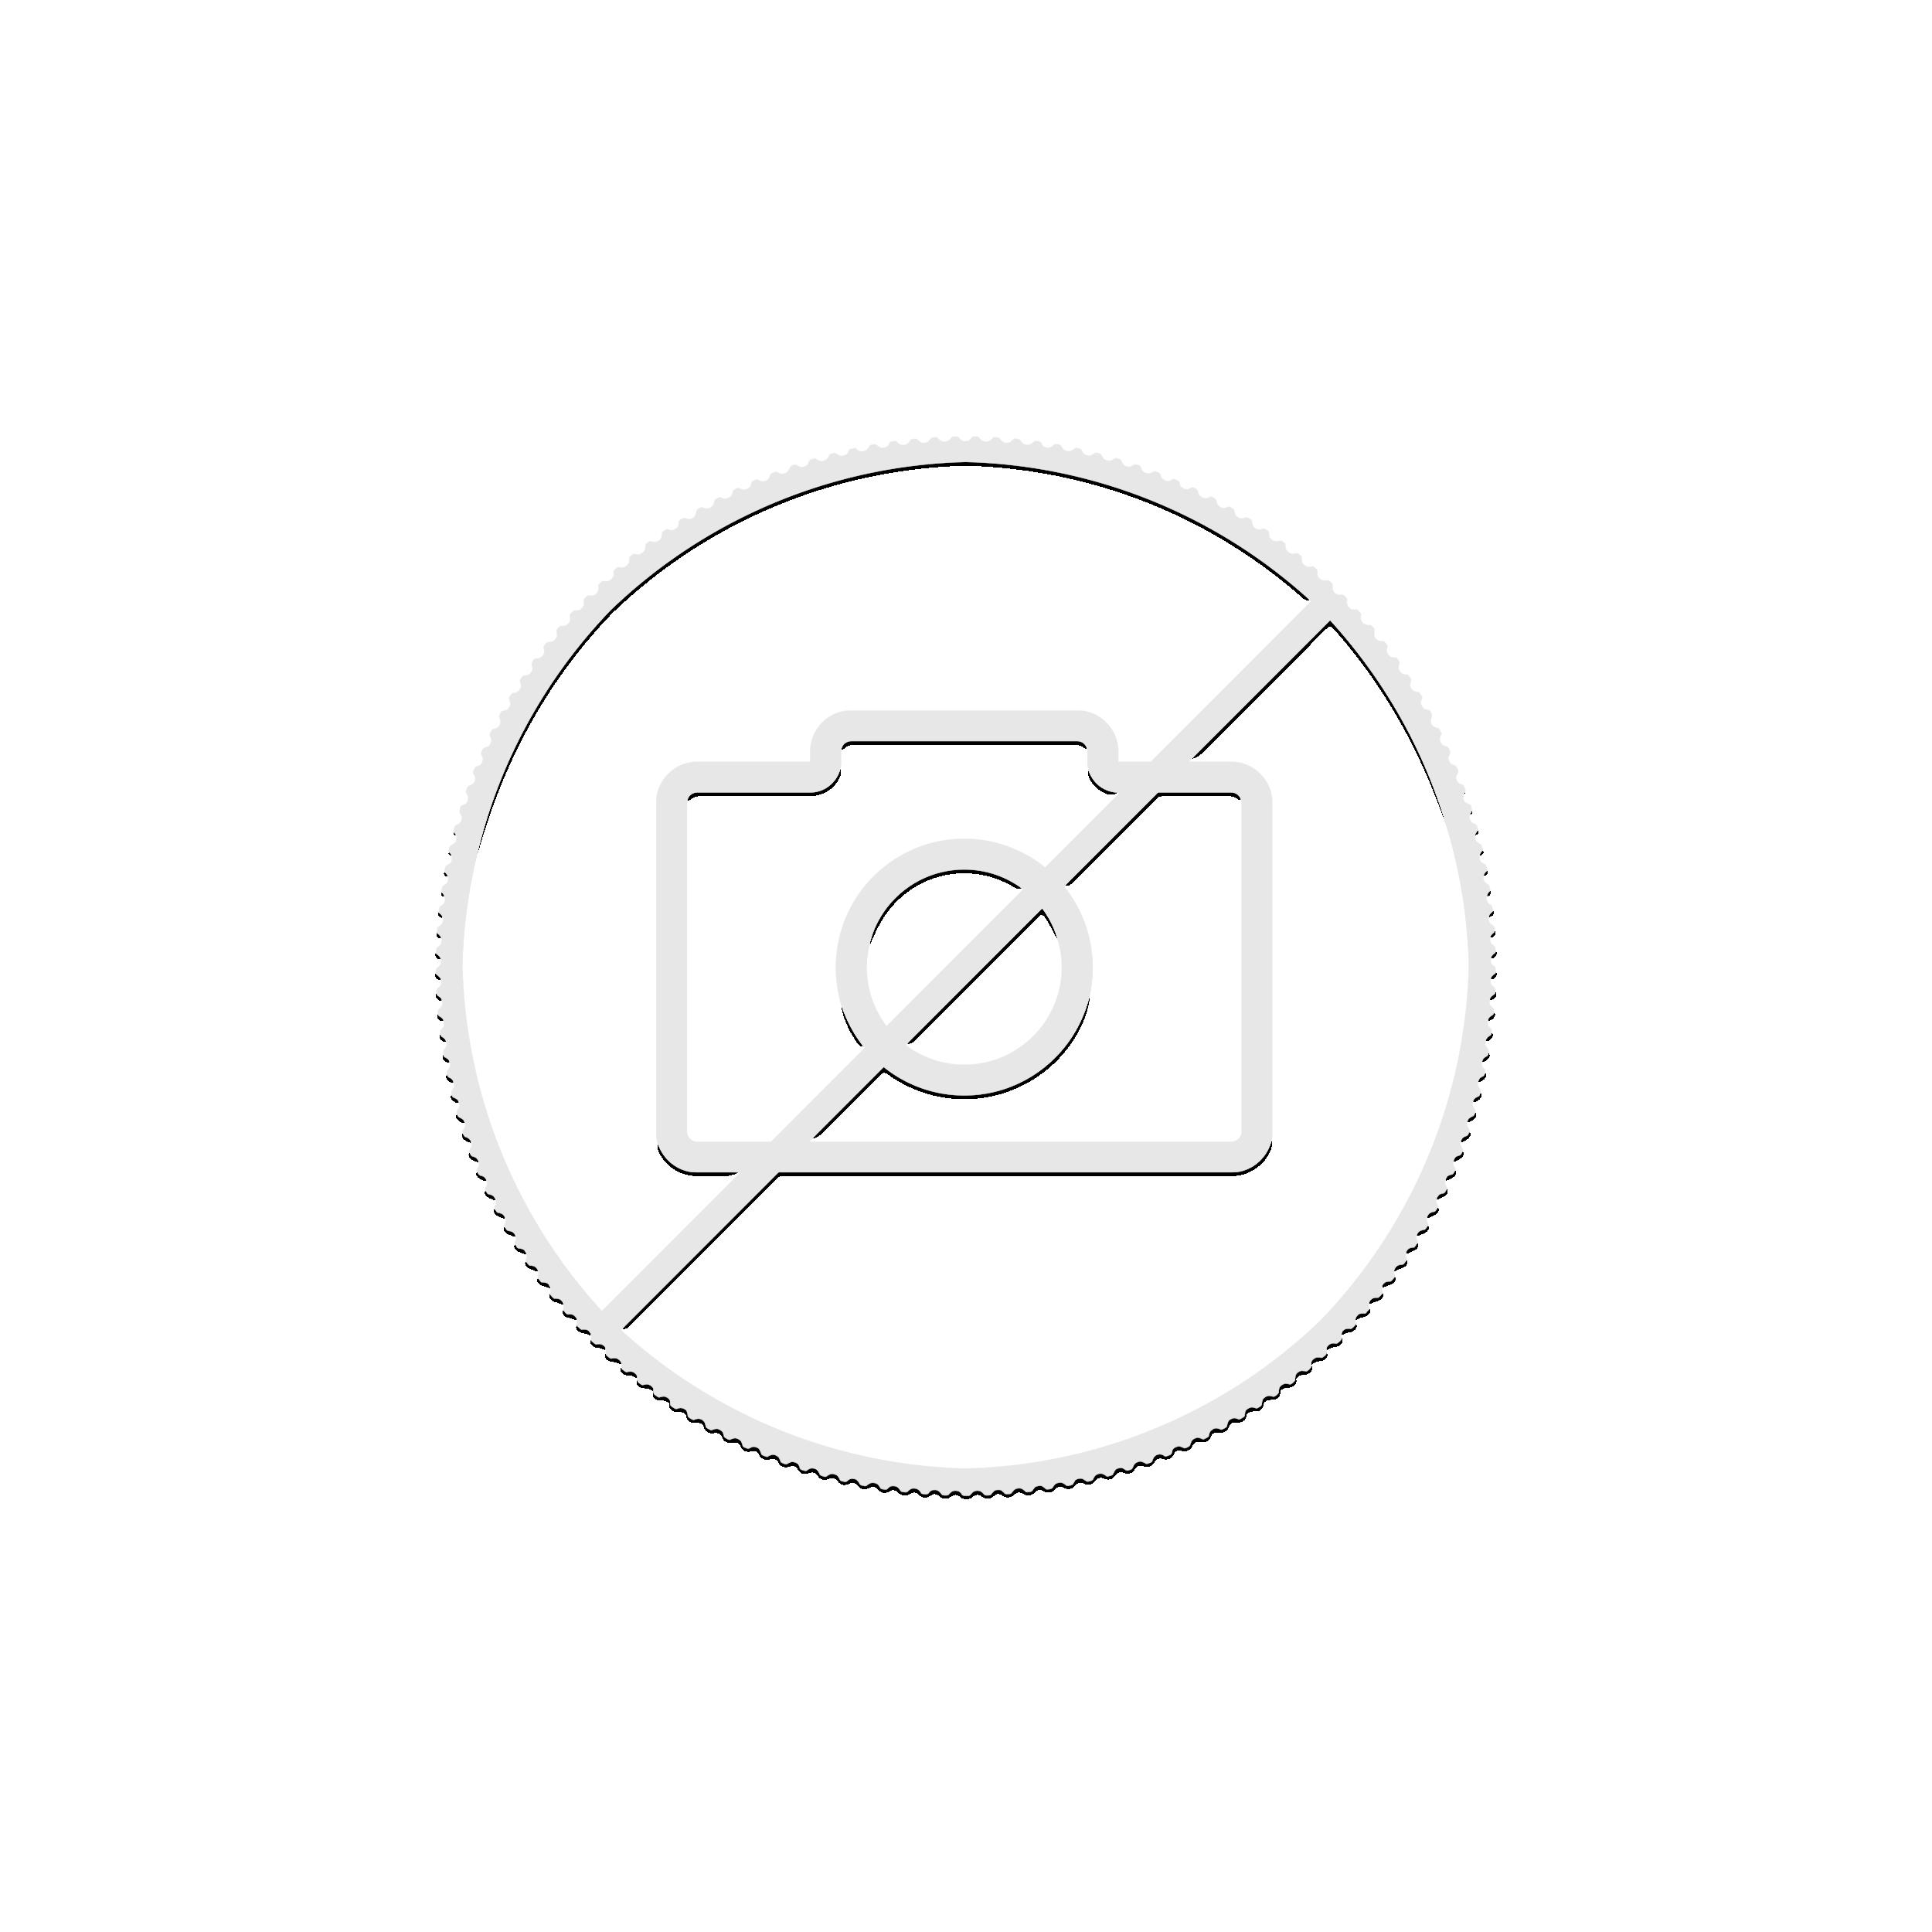 1 Troy ounce zilveren munt Panda 2012